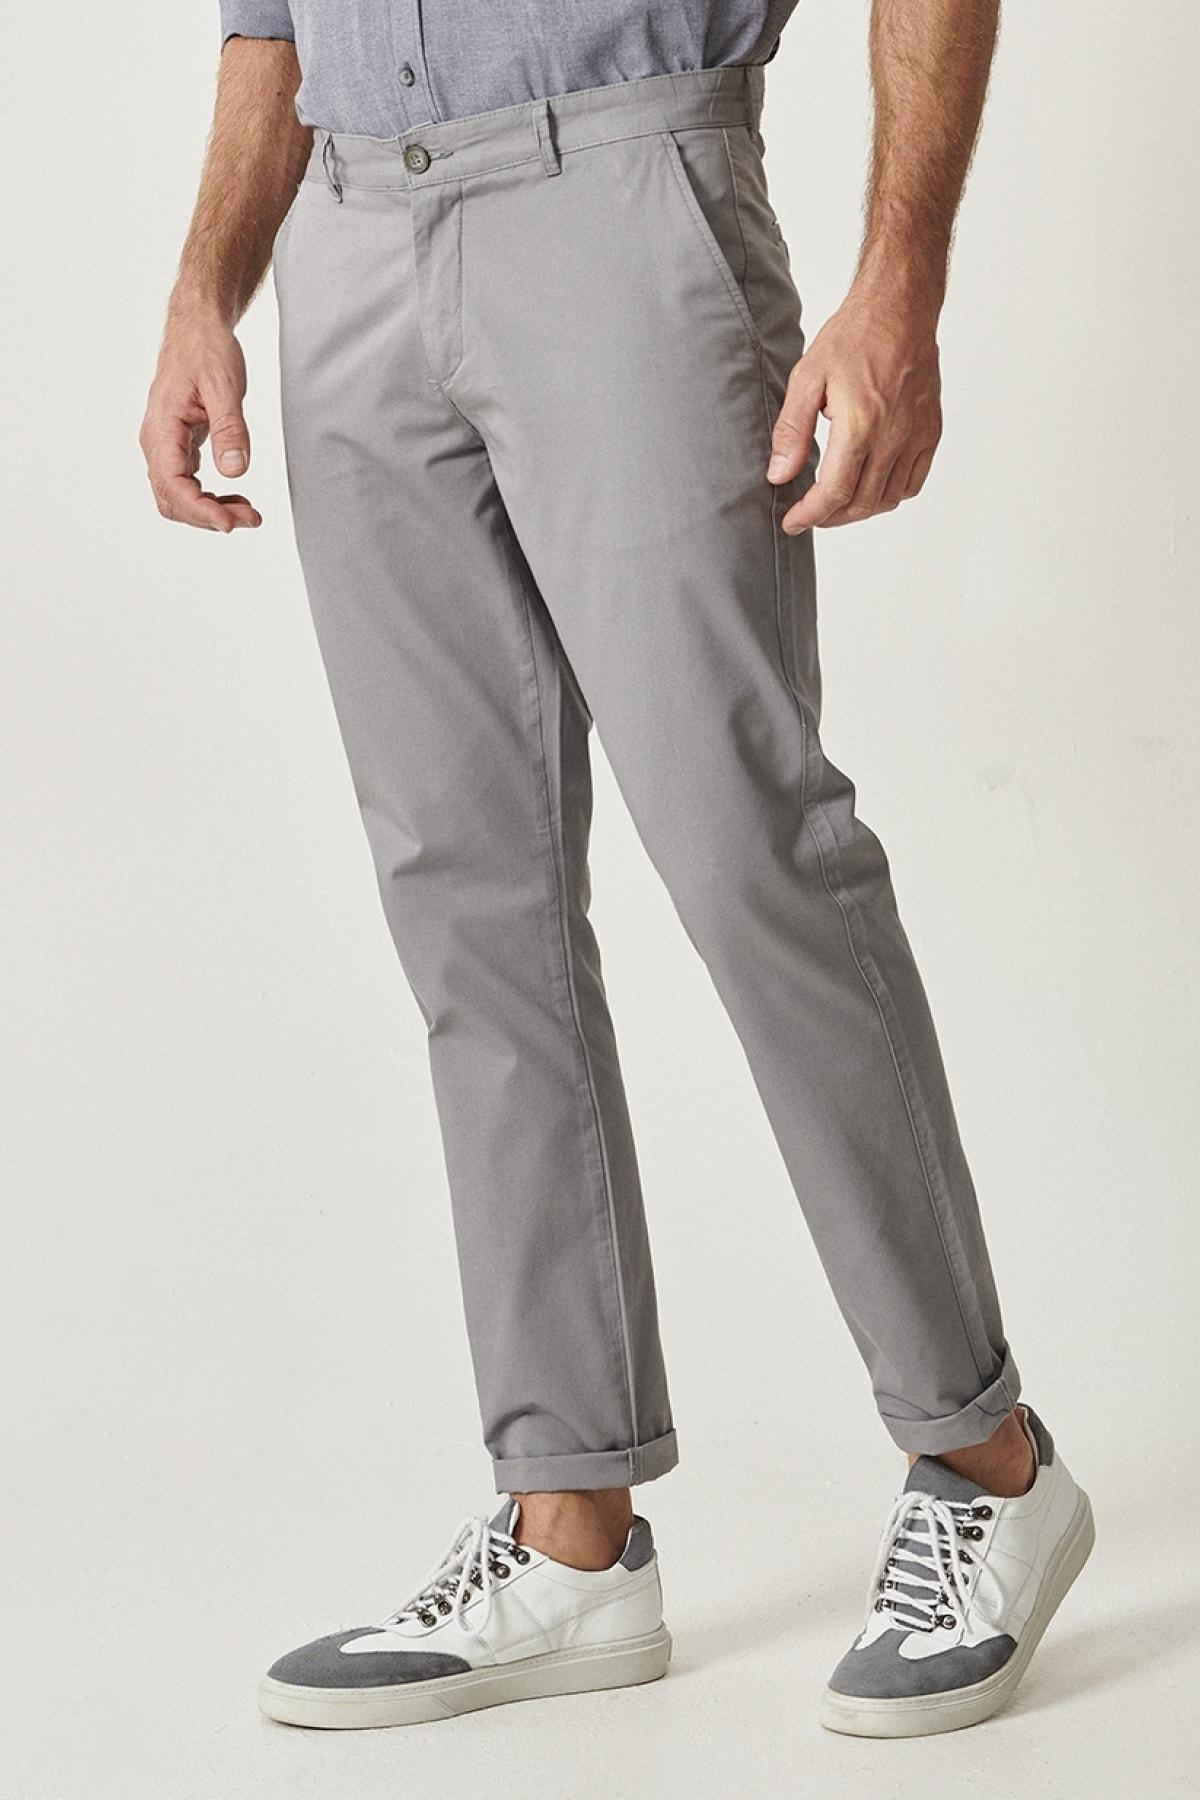 ALTINYILDIZ CLASSICS Erkek Gri Kanvas Slim Fit Chino Pantolon 1